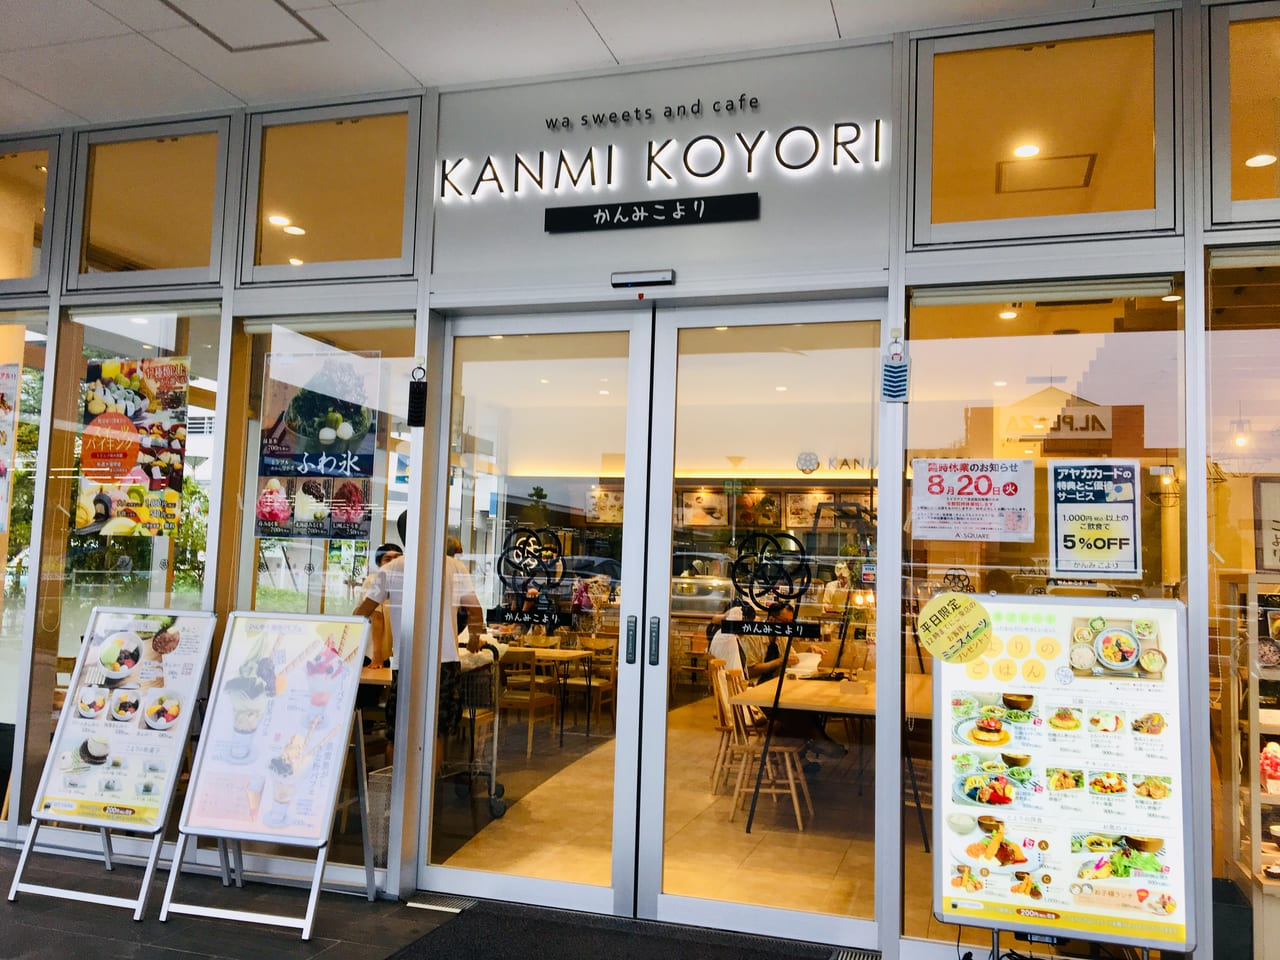 kanmikoyori